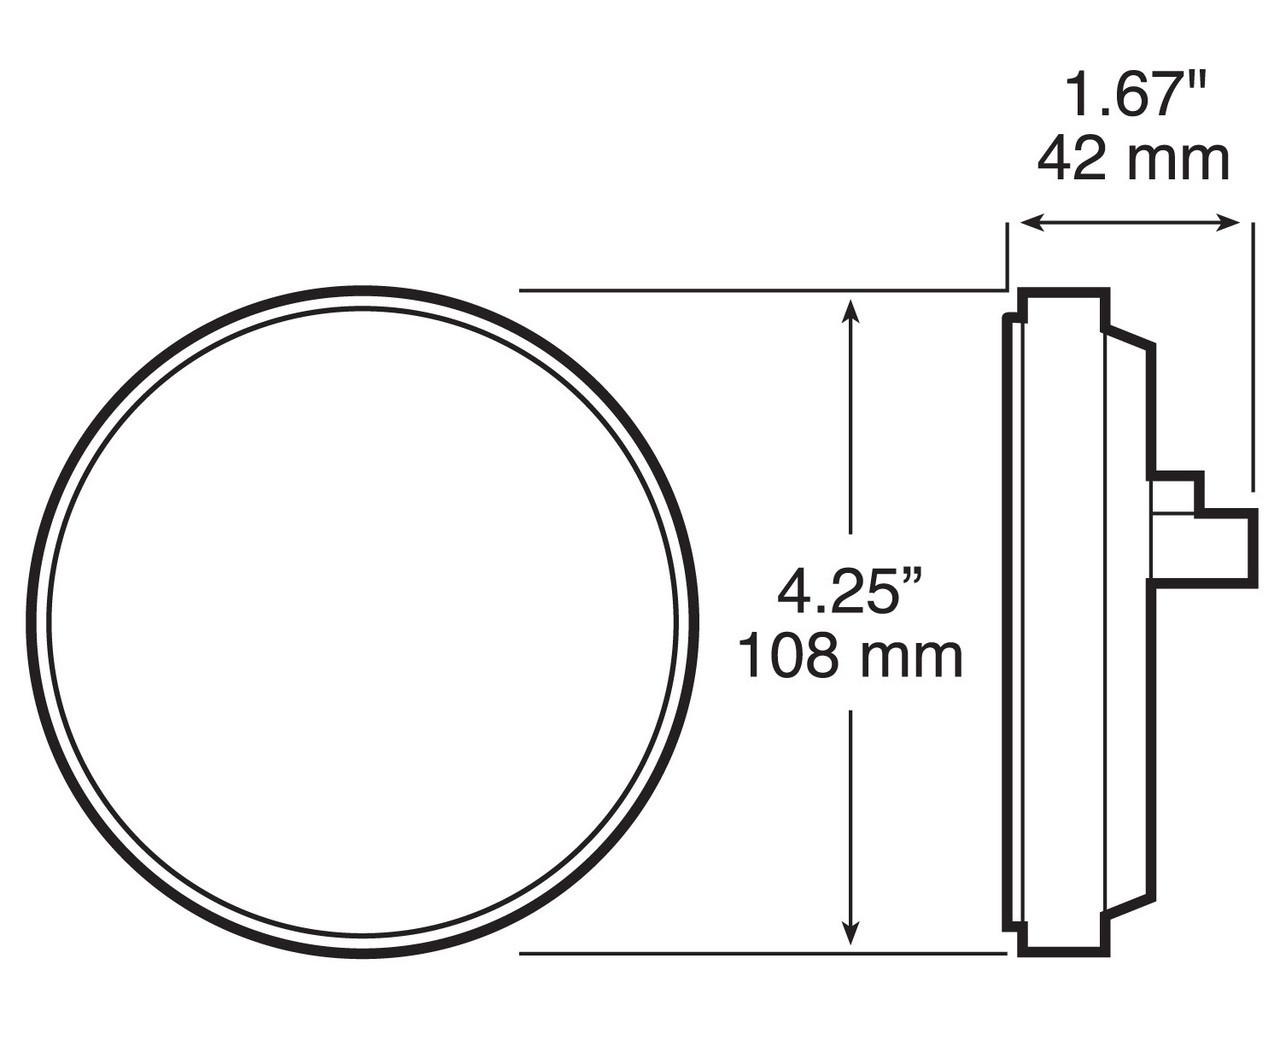 "LED415CBUK7 --- LED Round 4"" Back Up DOT Light Kit - 7 Diodes"